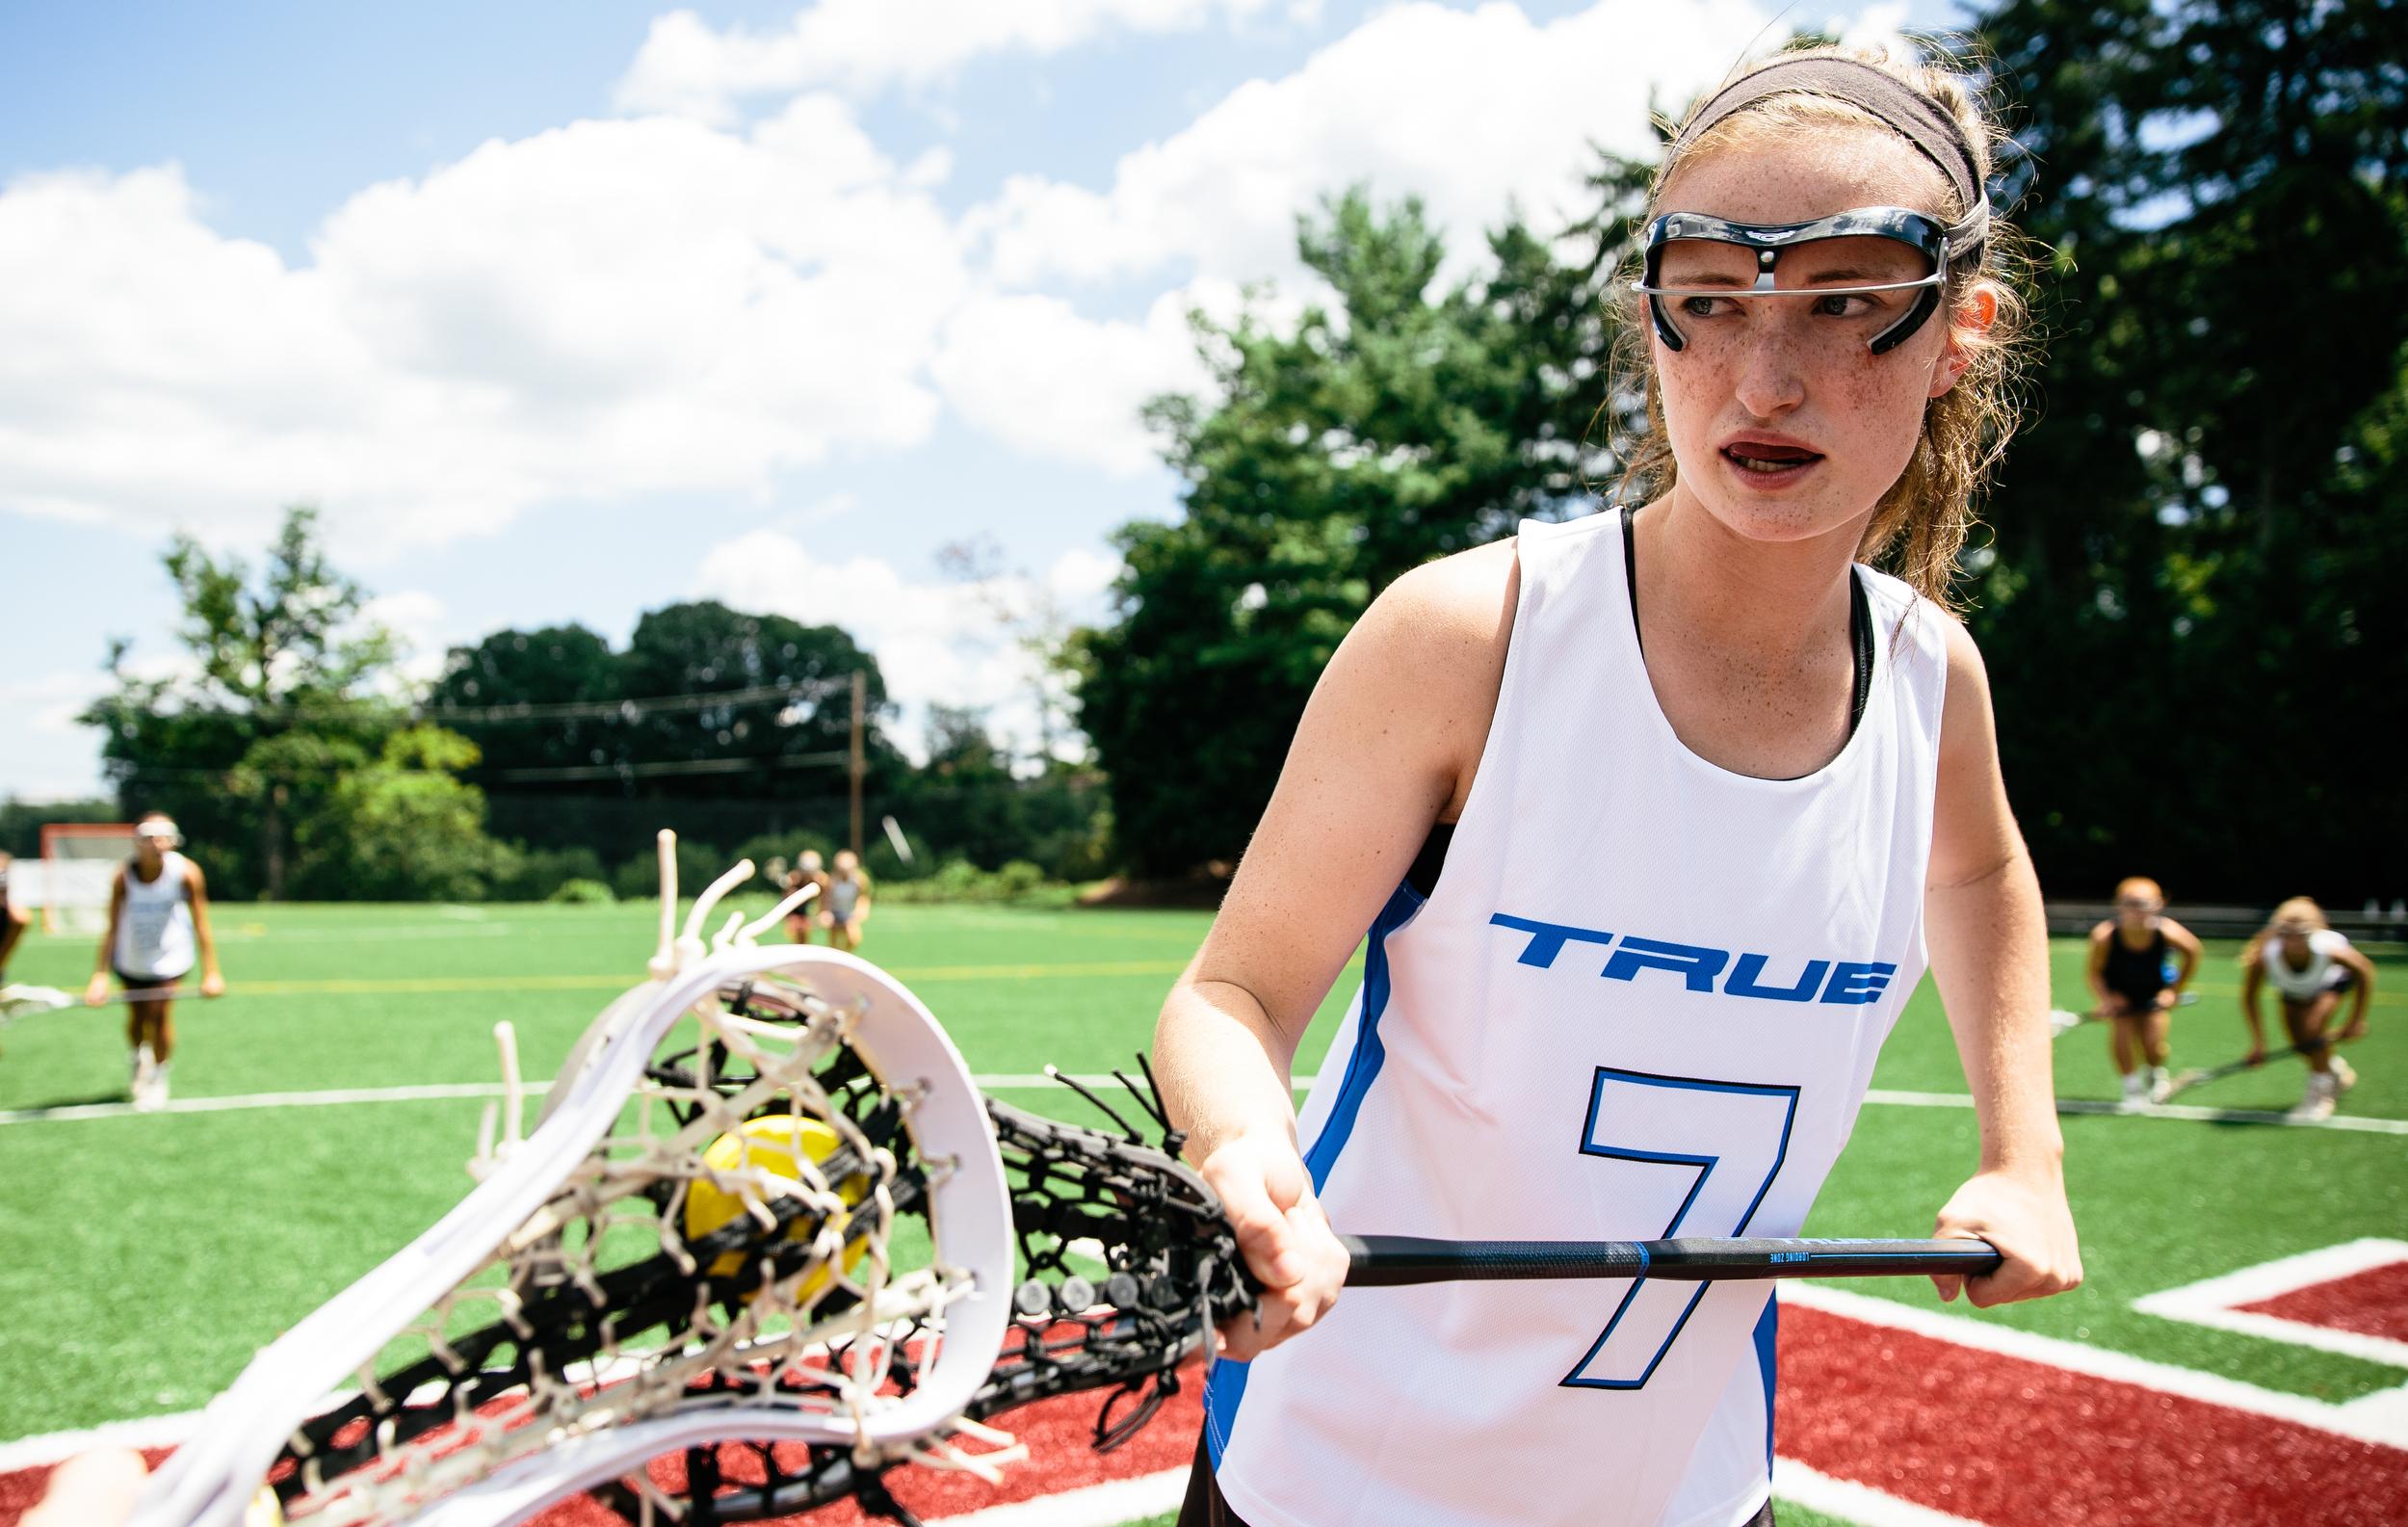 Jul 22, 2015; Baltimore, MD, USA; TRUE Lacrosse brand shoot at Boy's Latin School of Maryland in Baltimore, MD. Girls. Mandatory Credit: Brian Schneider-www.ebrianschneider.com